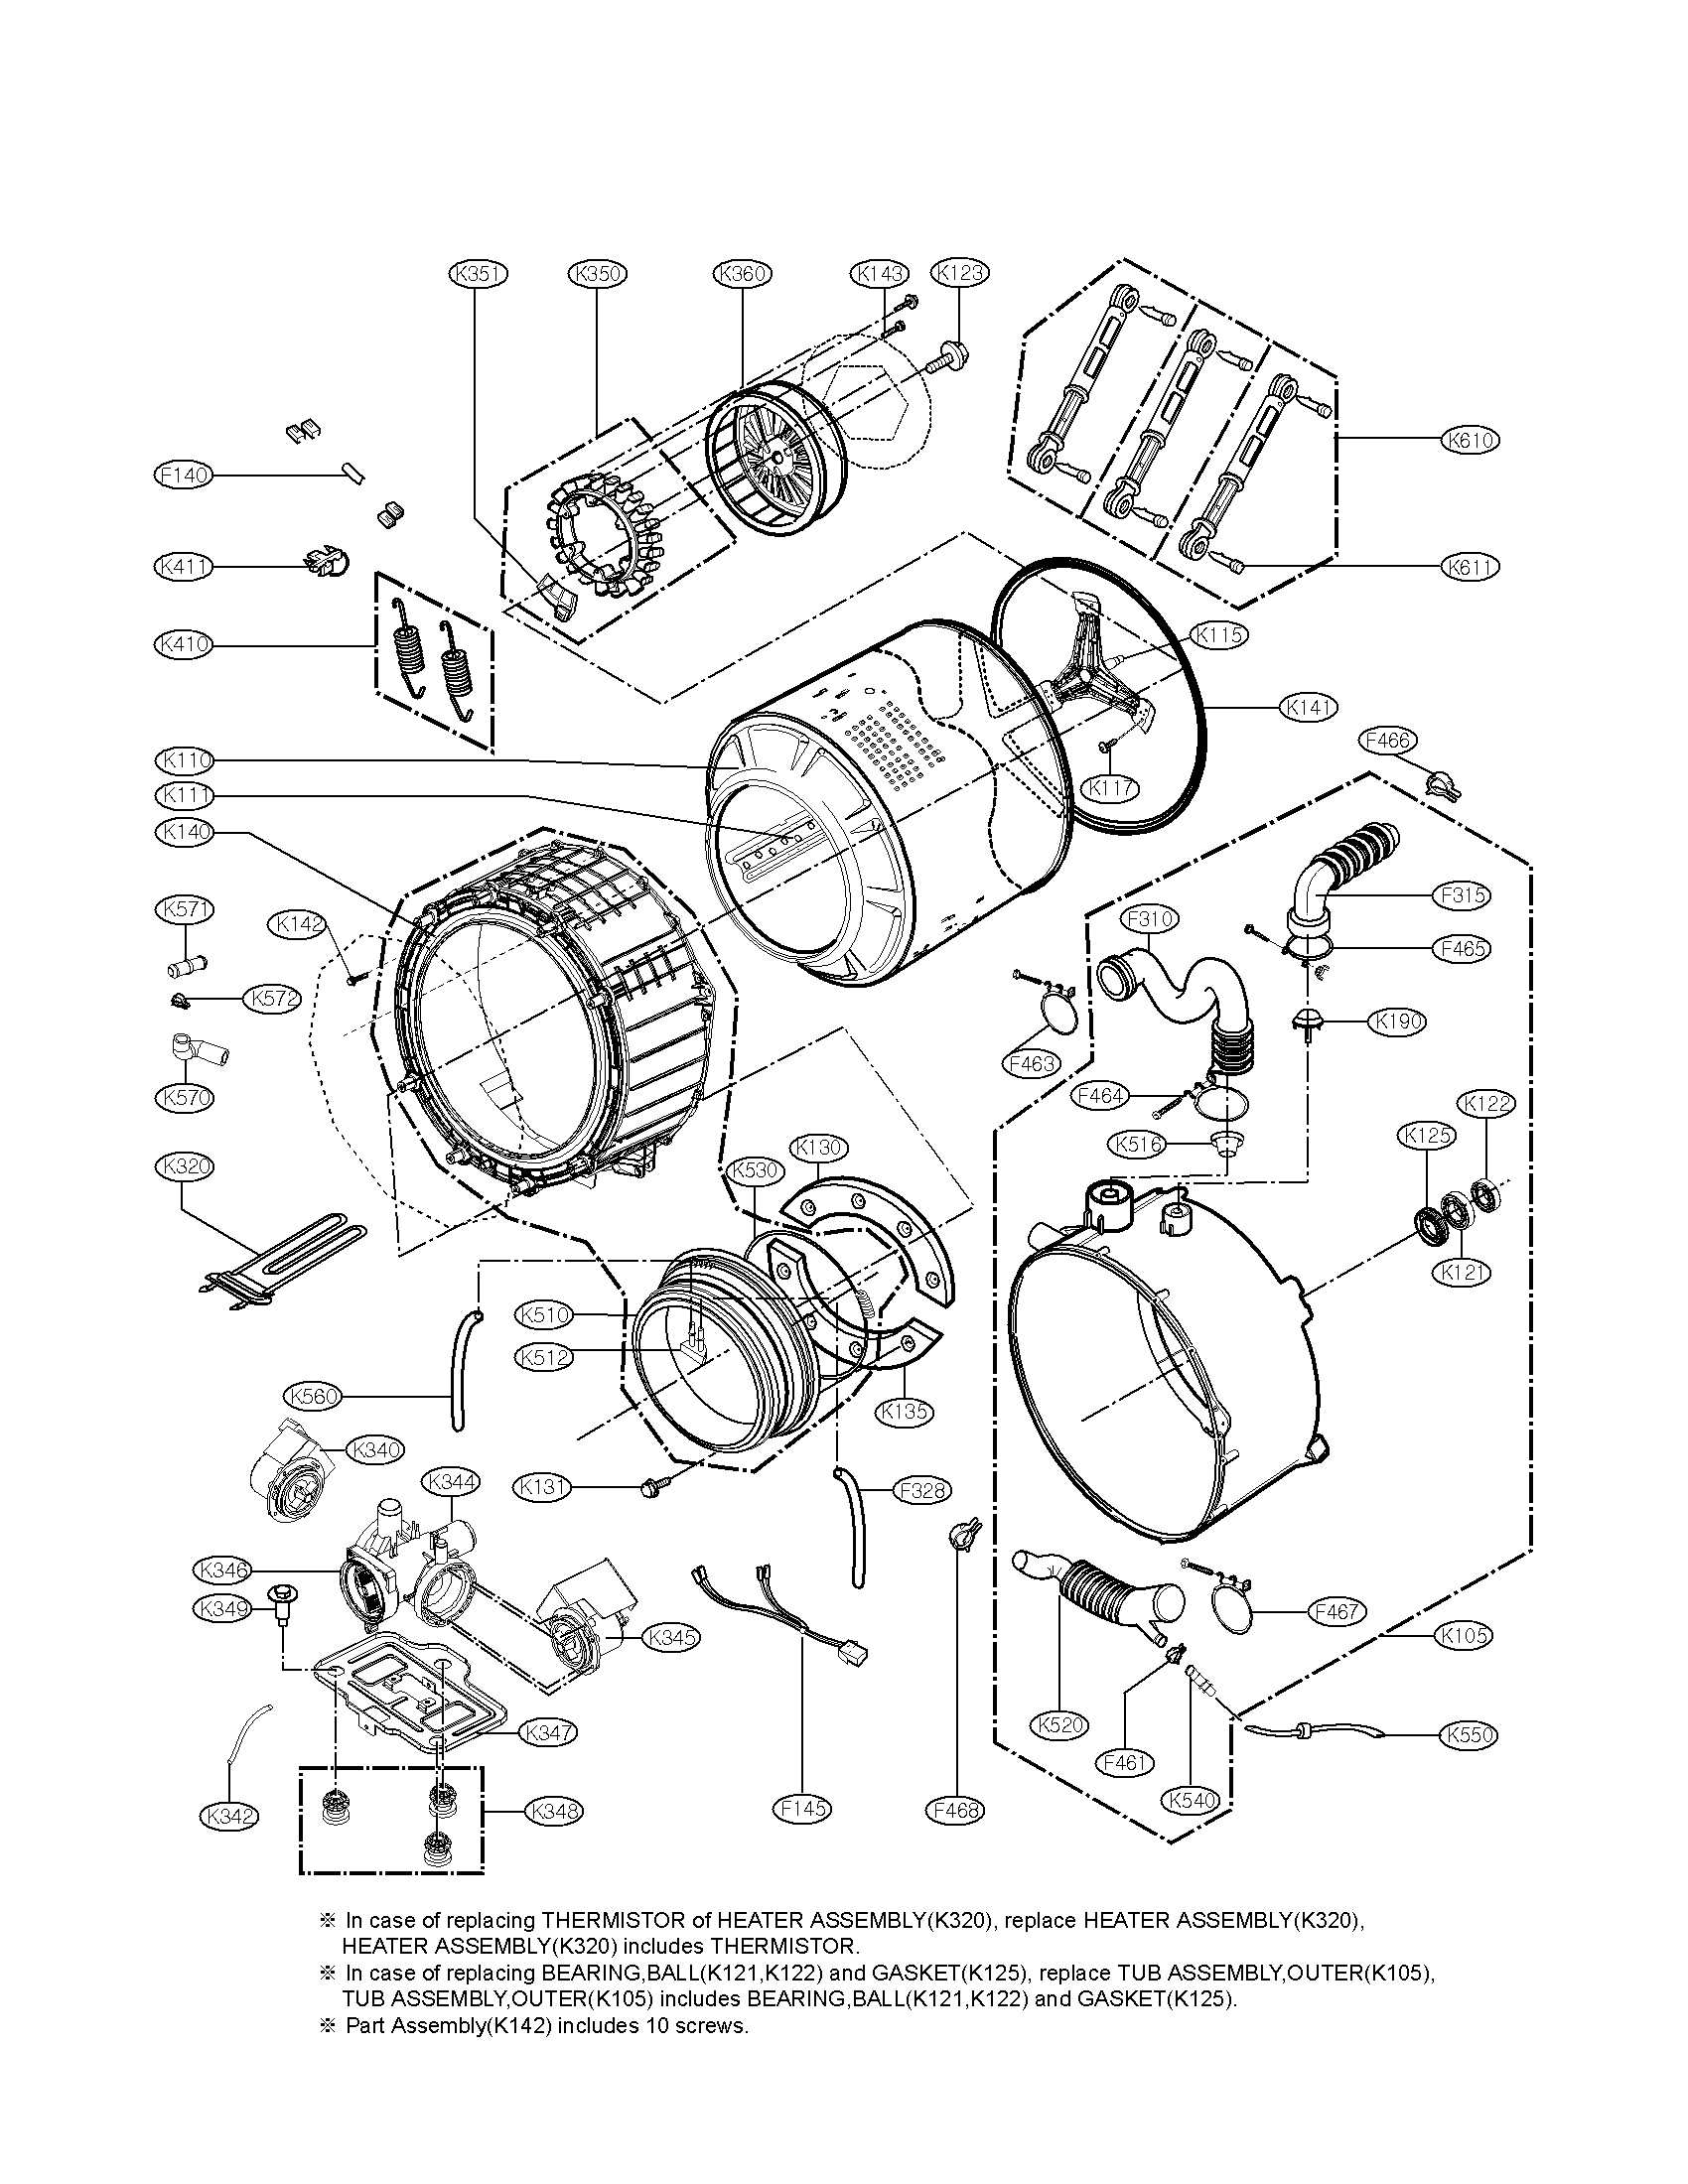 Lg washing machine parts model wm3360hwca sears partsdirect